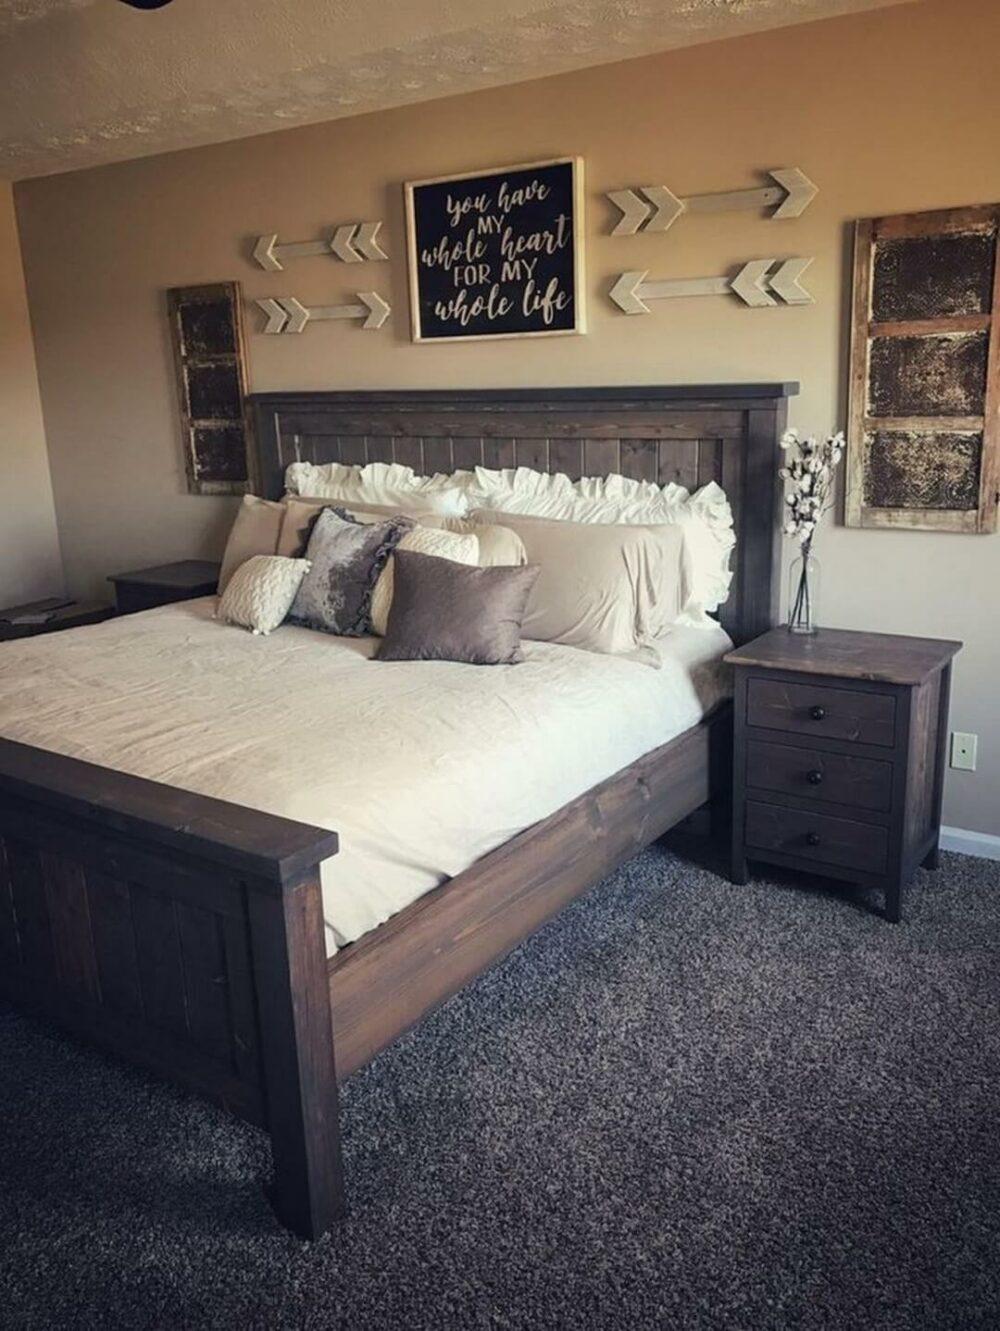 grey carpet bedroom decor ideas